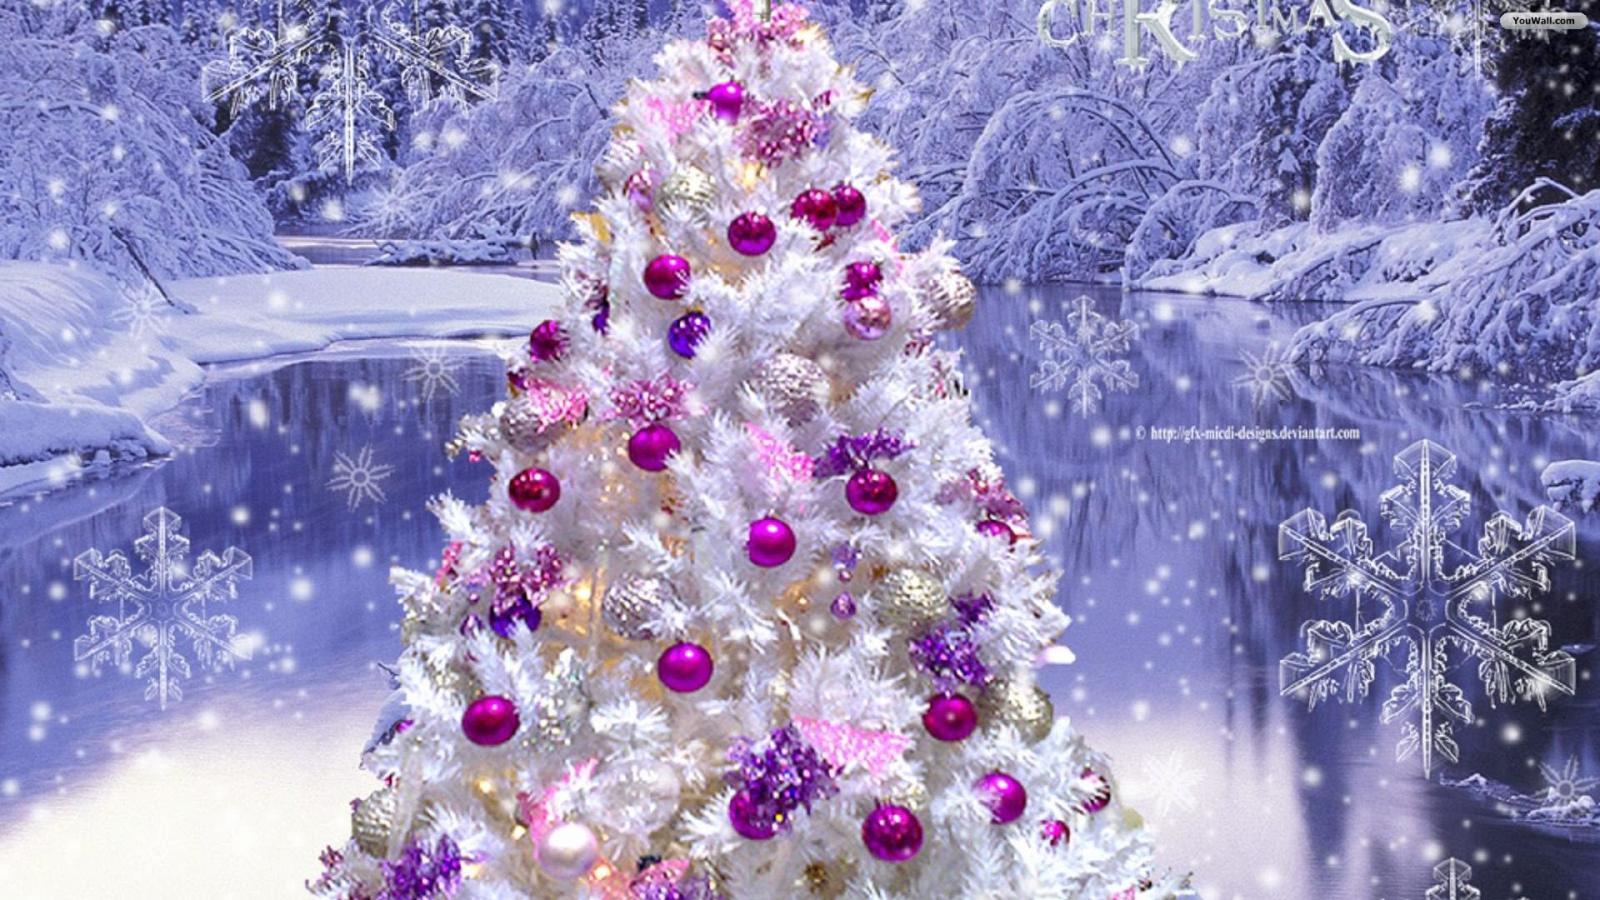 Pink Christmas Tree Wallpaper   wallpaperwallpapersfree wallpaper 1600x900